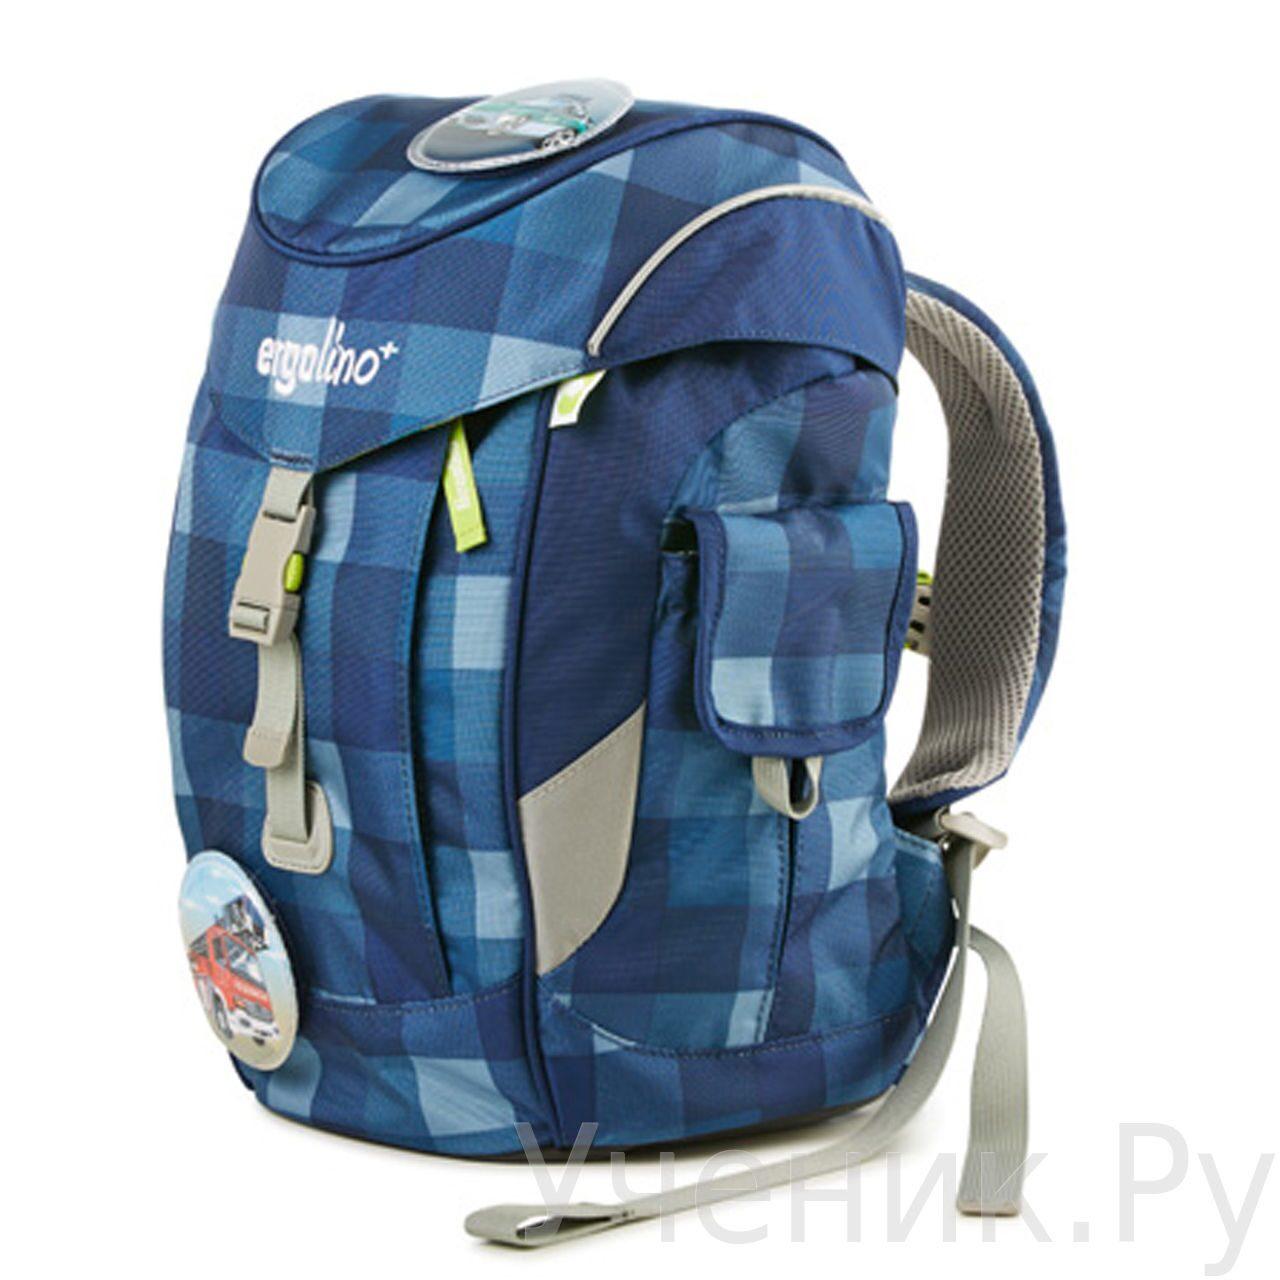 Рюкзак ergobag ergolino рюкзак бобер и кондор